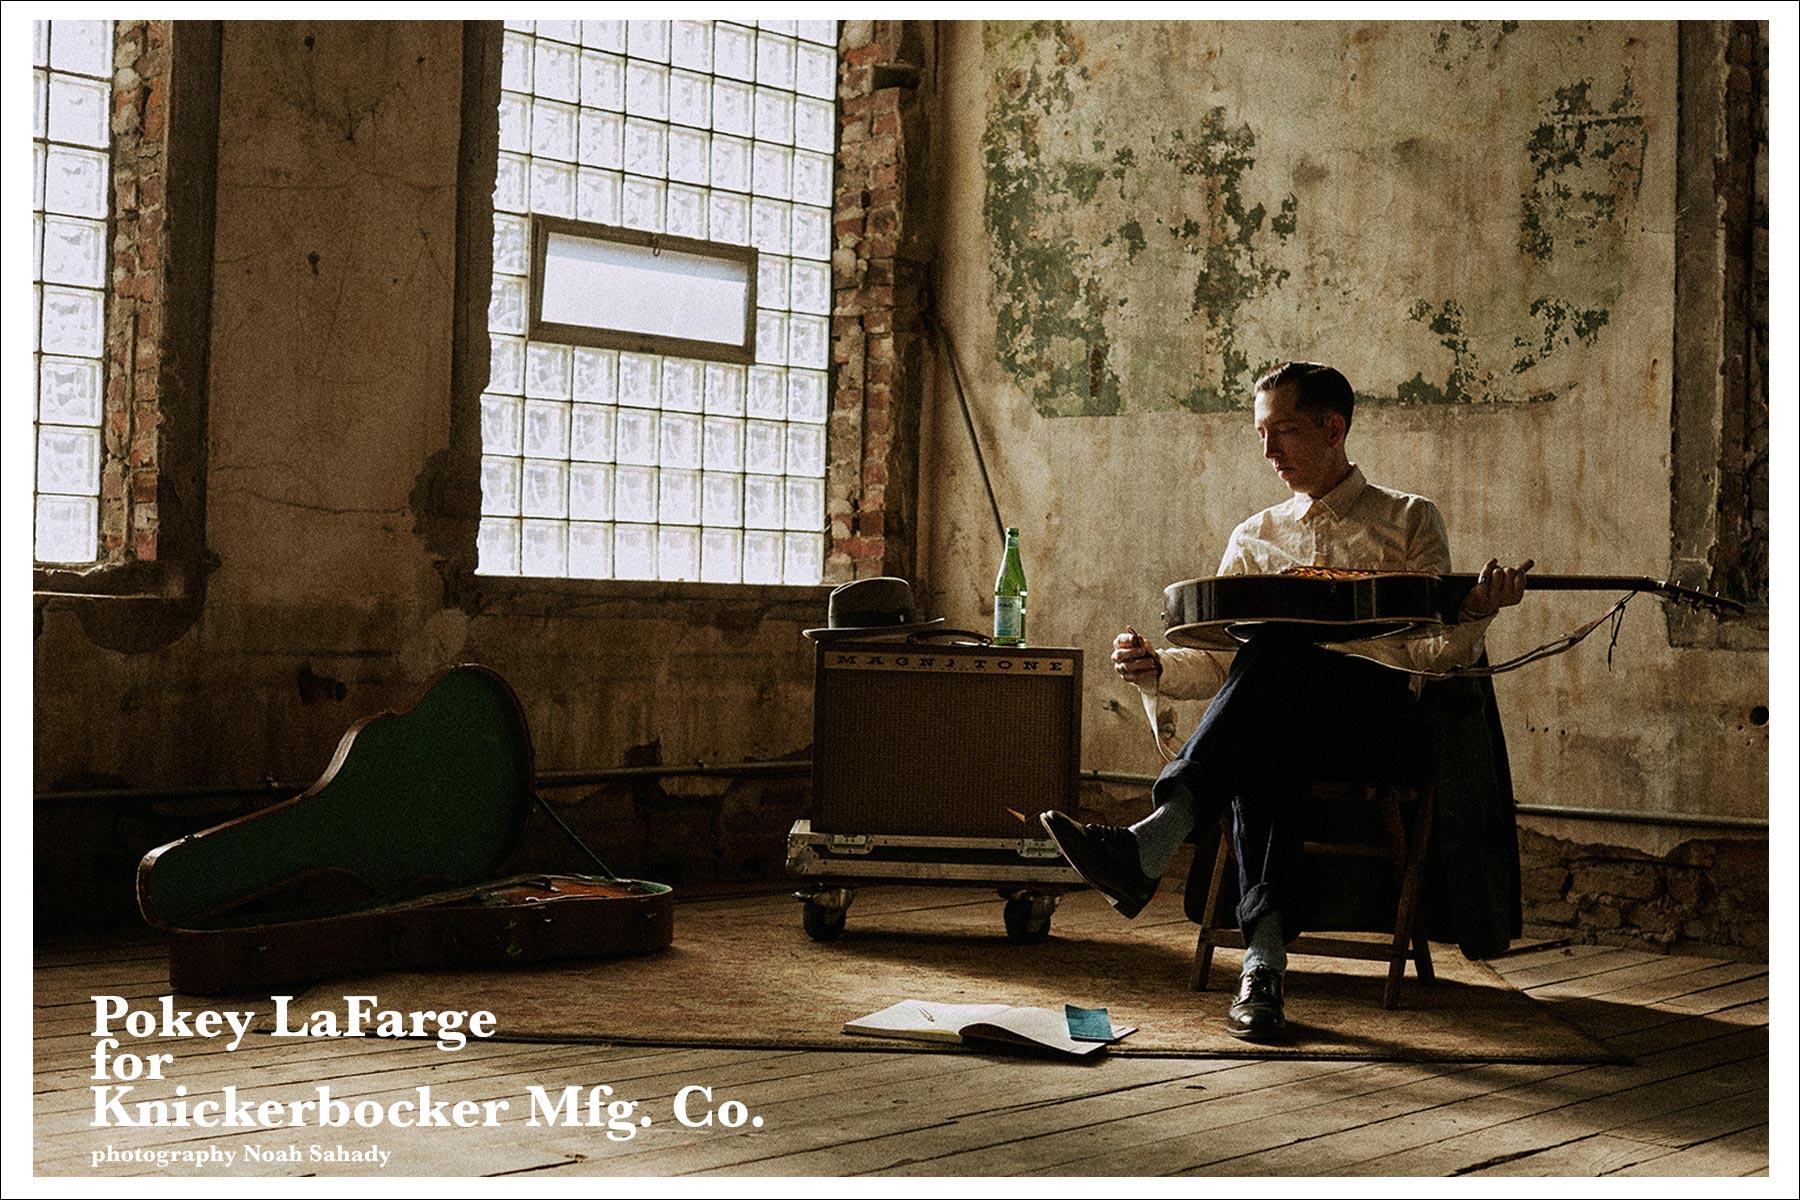 Musician Pokey LaFarge photographed by Noah Sahady for his clothing collaboration with Knickerbocker Mfg. Co. Ponyboy magazine NY.